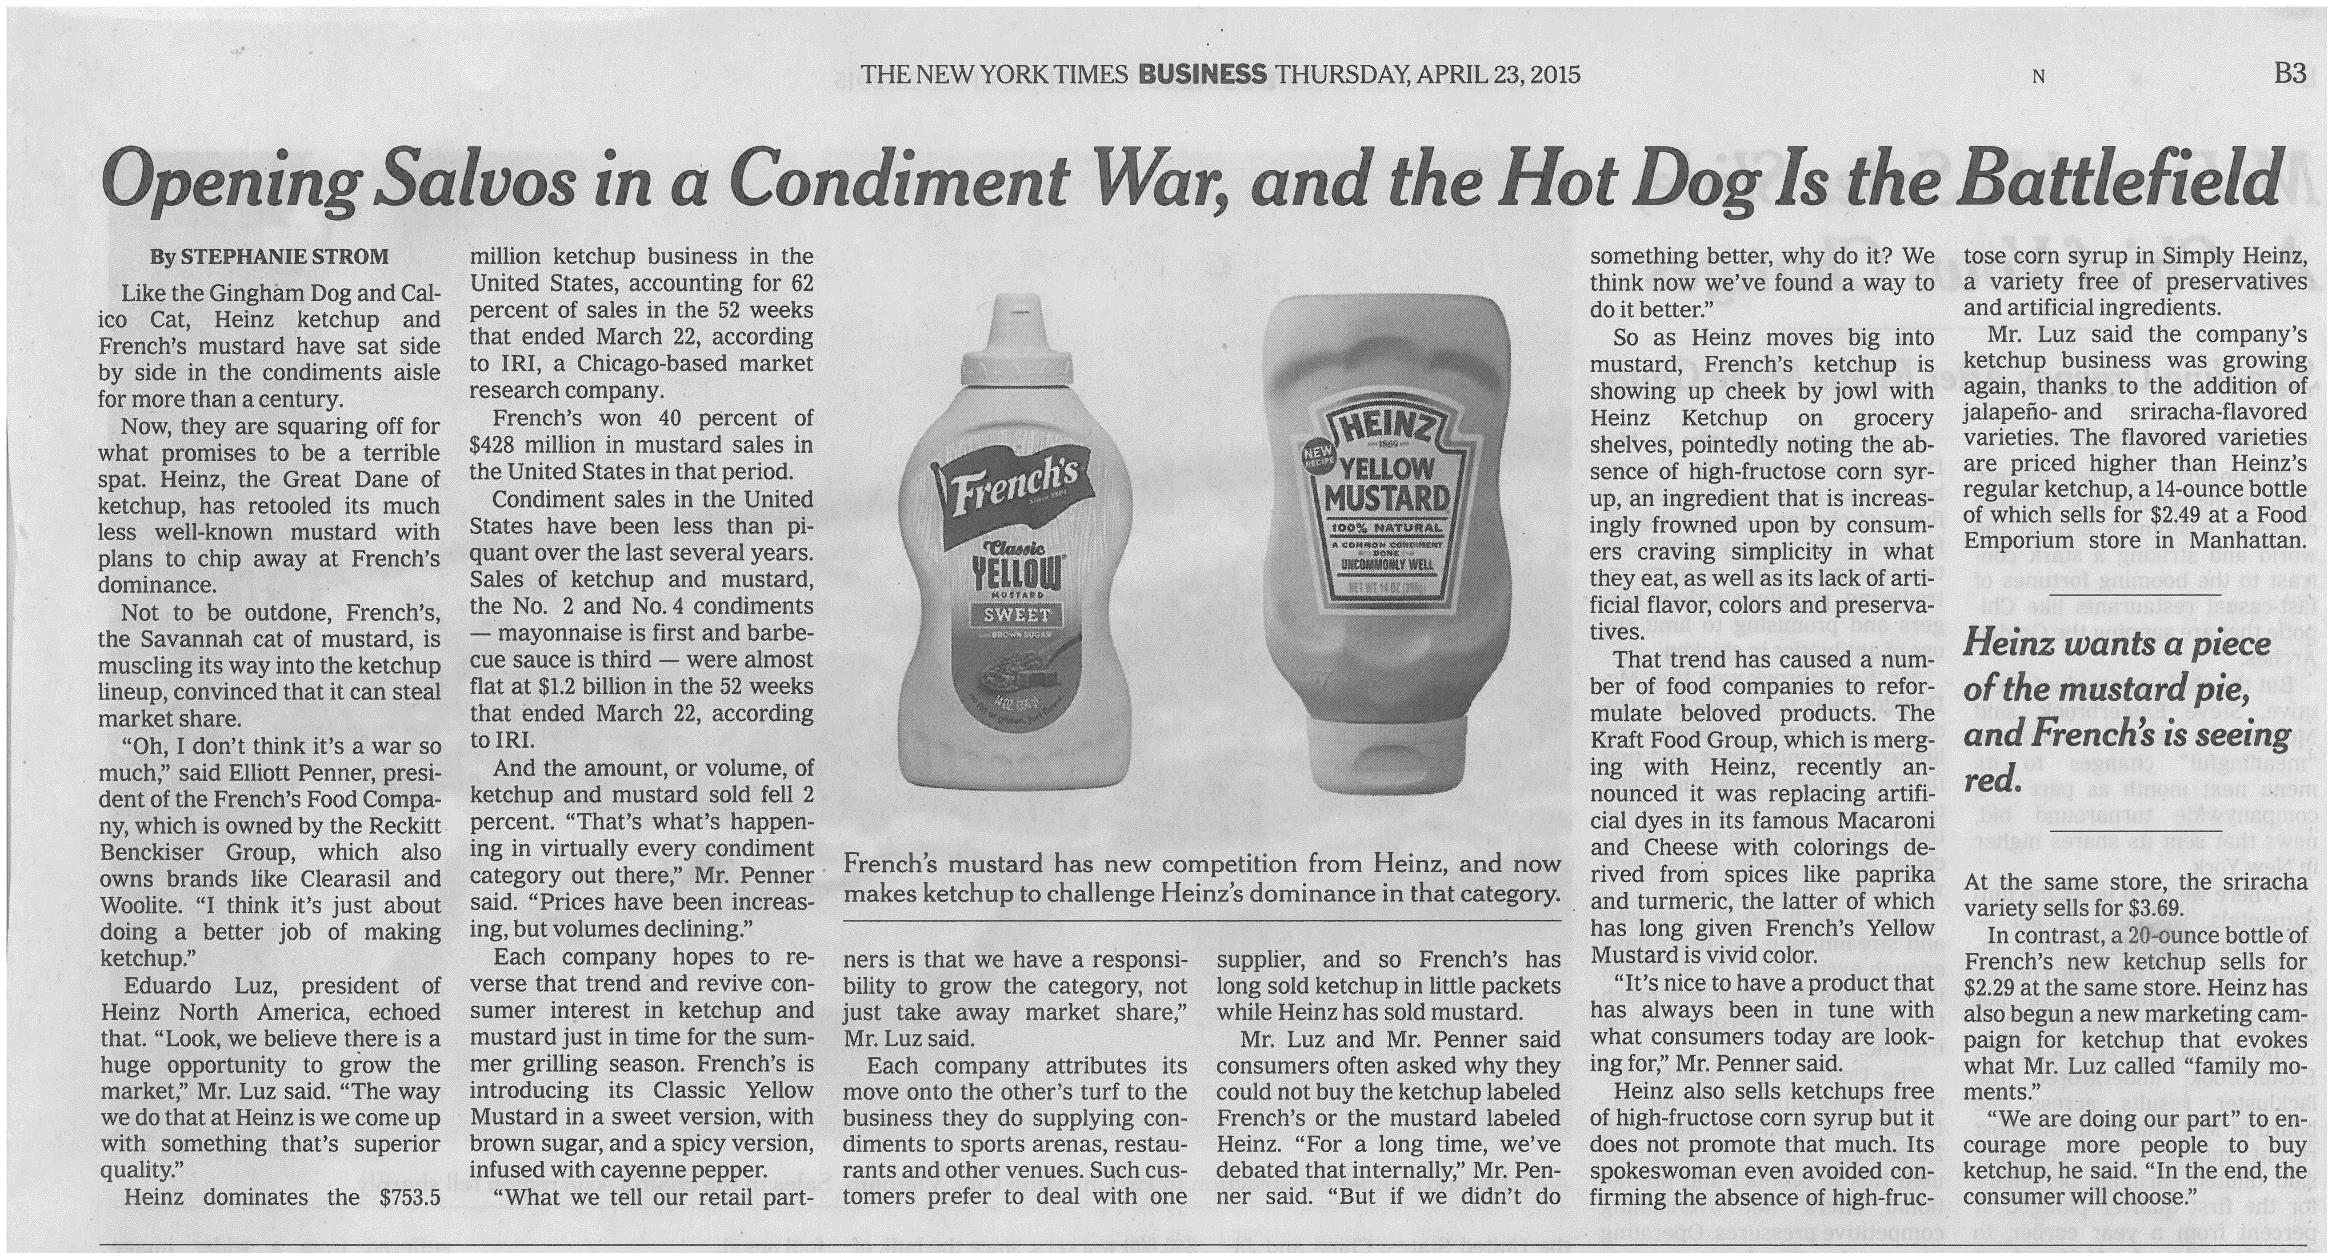 New York Times- Thursday, April 23, 2015